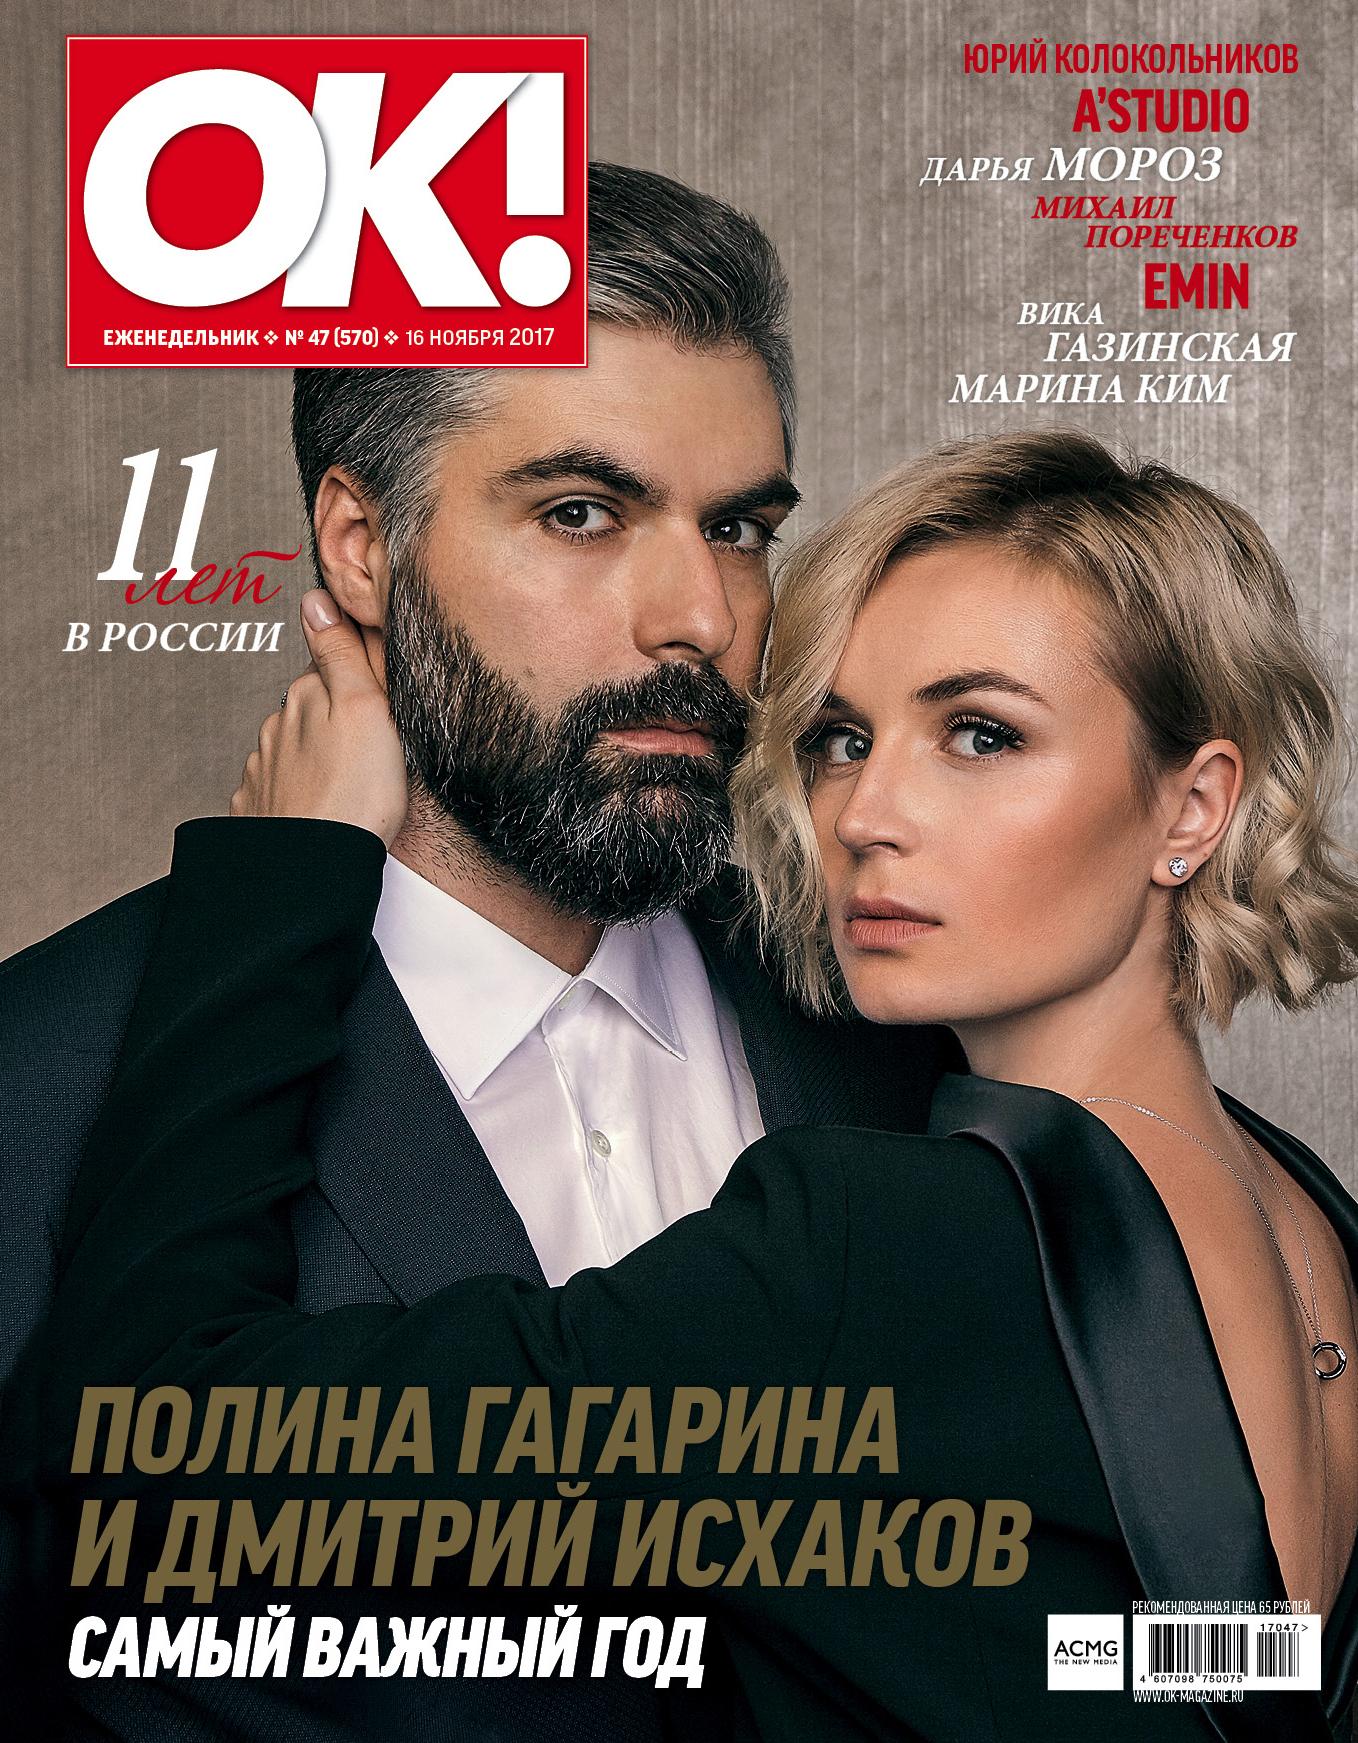 Полина Гагарина в A LA RUSSE на обложке журнала  OK!